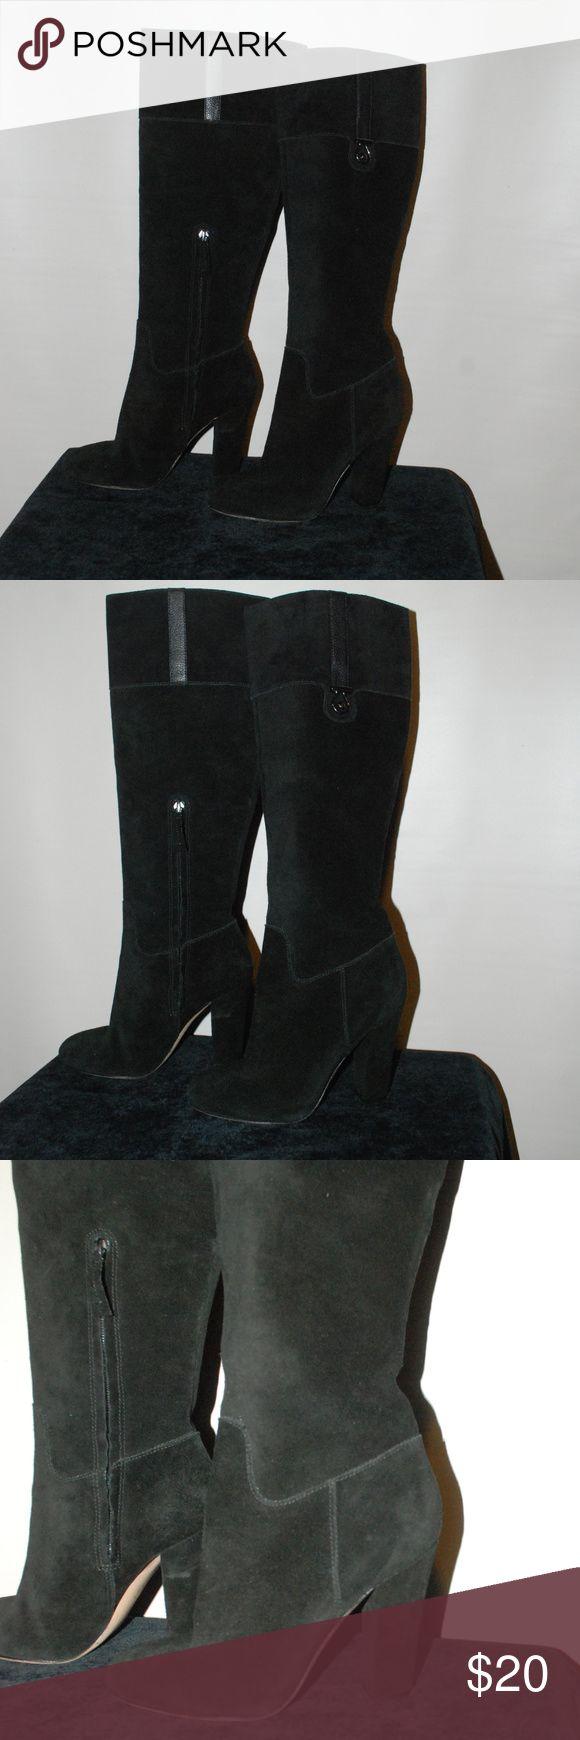 "Joan & David Black knee high boots 4"" Joan & David Black knee high boots 4"" Good clean condition Chunky heel side zipper top of shaft to bottom heel 16"" 14"" around at the top Joan & David Shoes Heeled Boots"